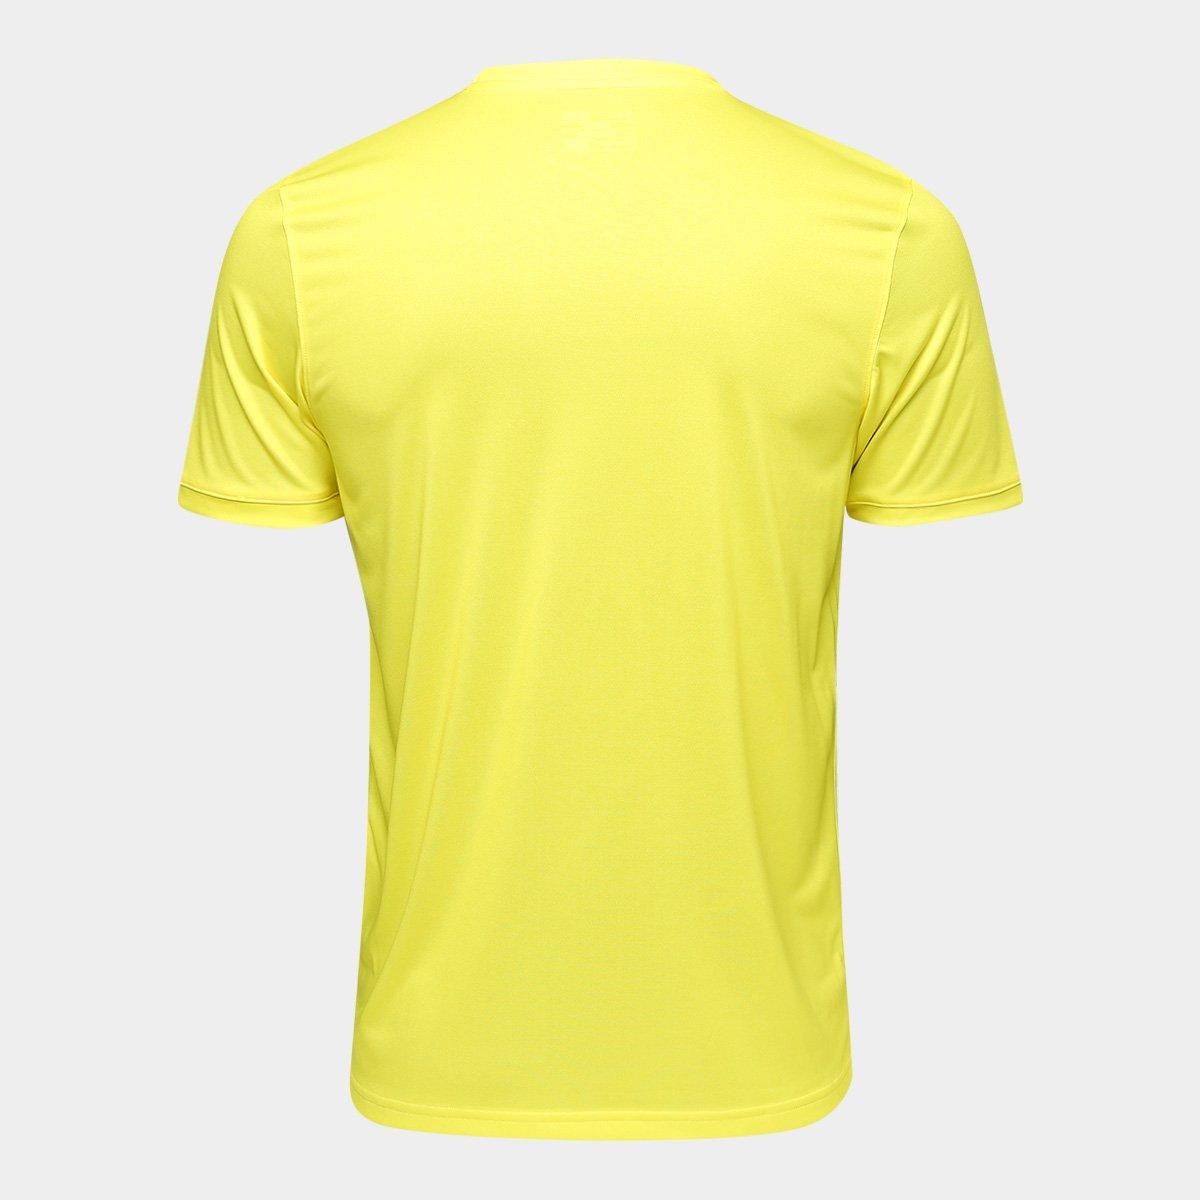 ad4af0ead3 ... Camisa Fluminense Goleiro II 17 18 Torcedor Under Armour Masculina ...